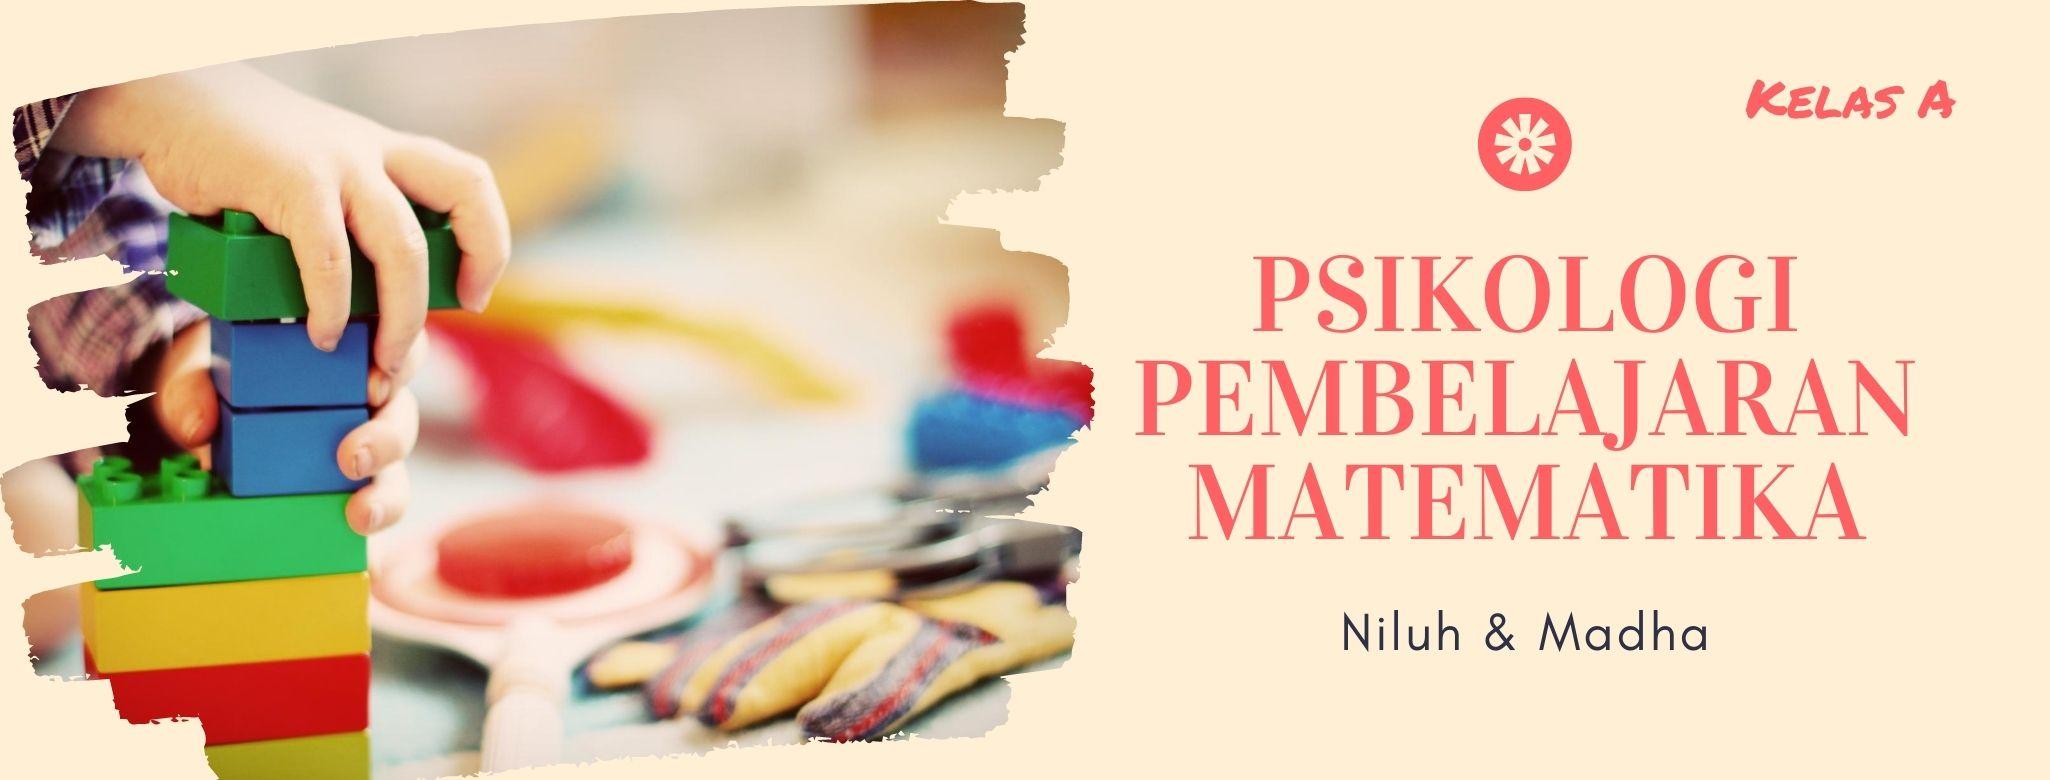 Psikologi Pembelajaran Matematika A (PMAT I/2020/2021) -NEW